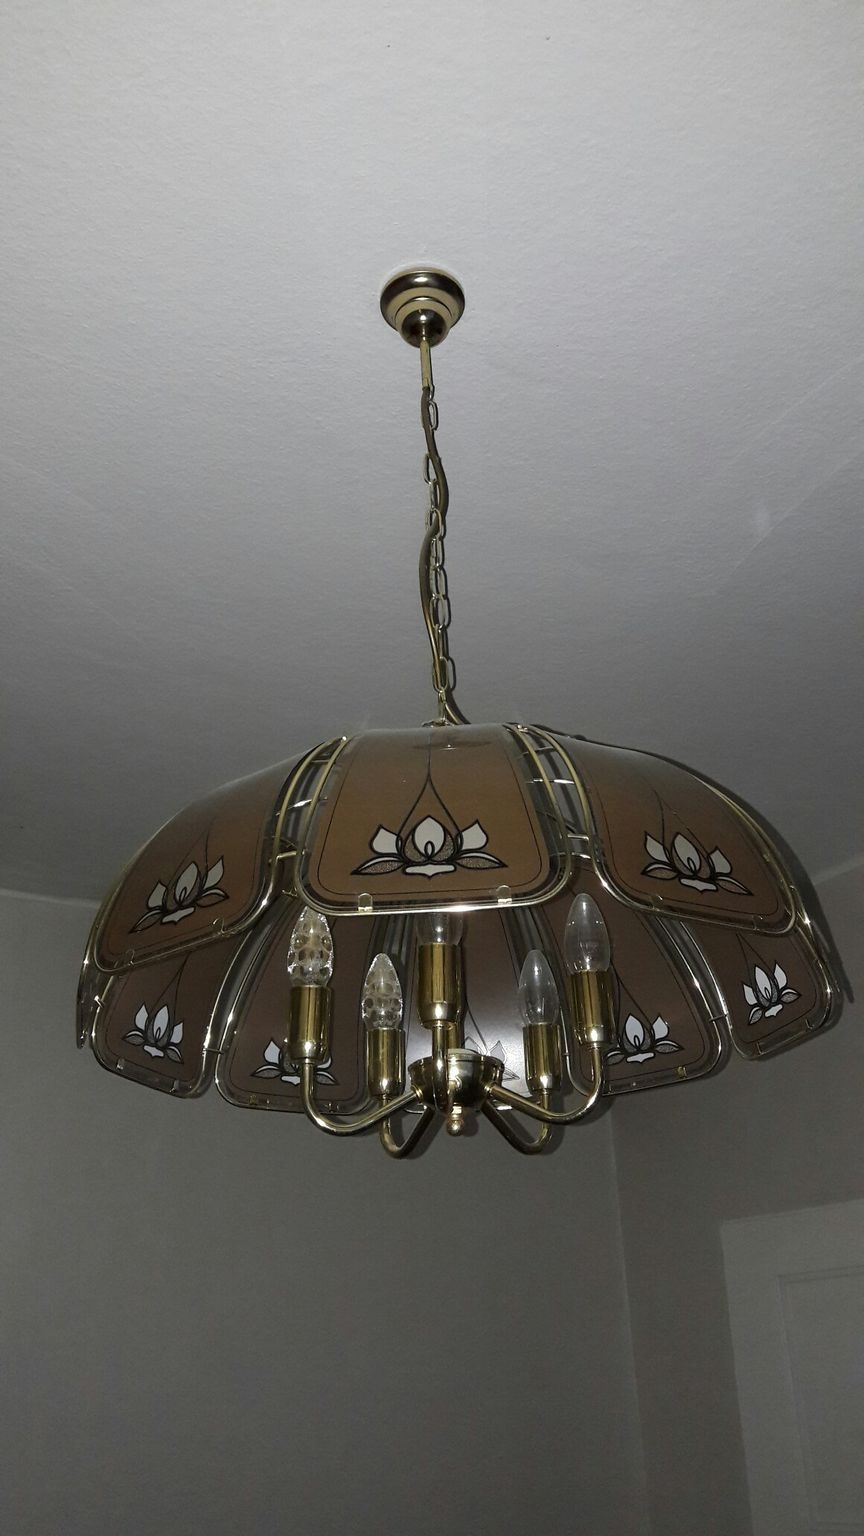 27 Das Beste Von Ddr Kuchenlampe With Images Pendant Light Ceiling Lights Light